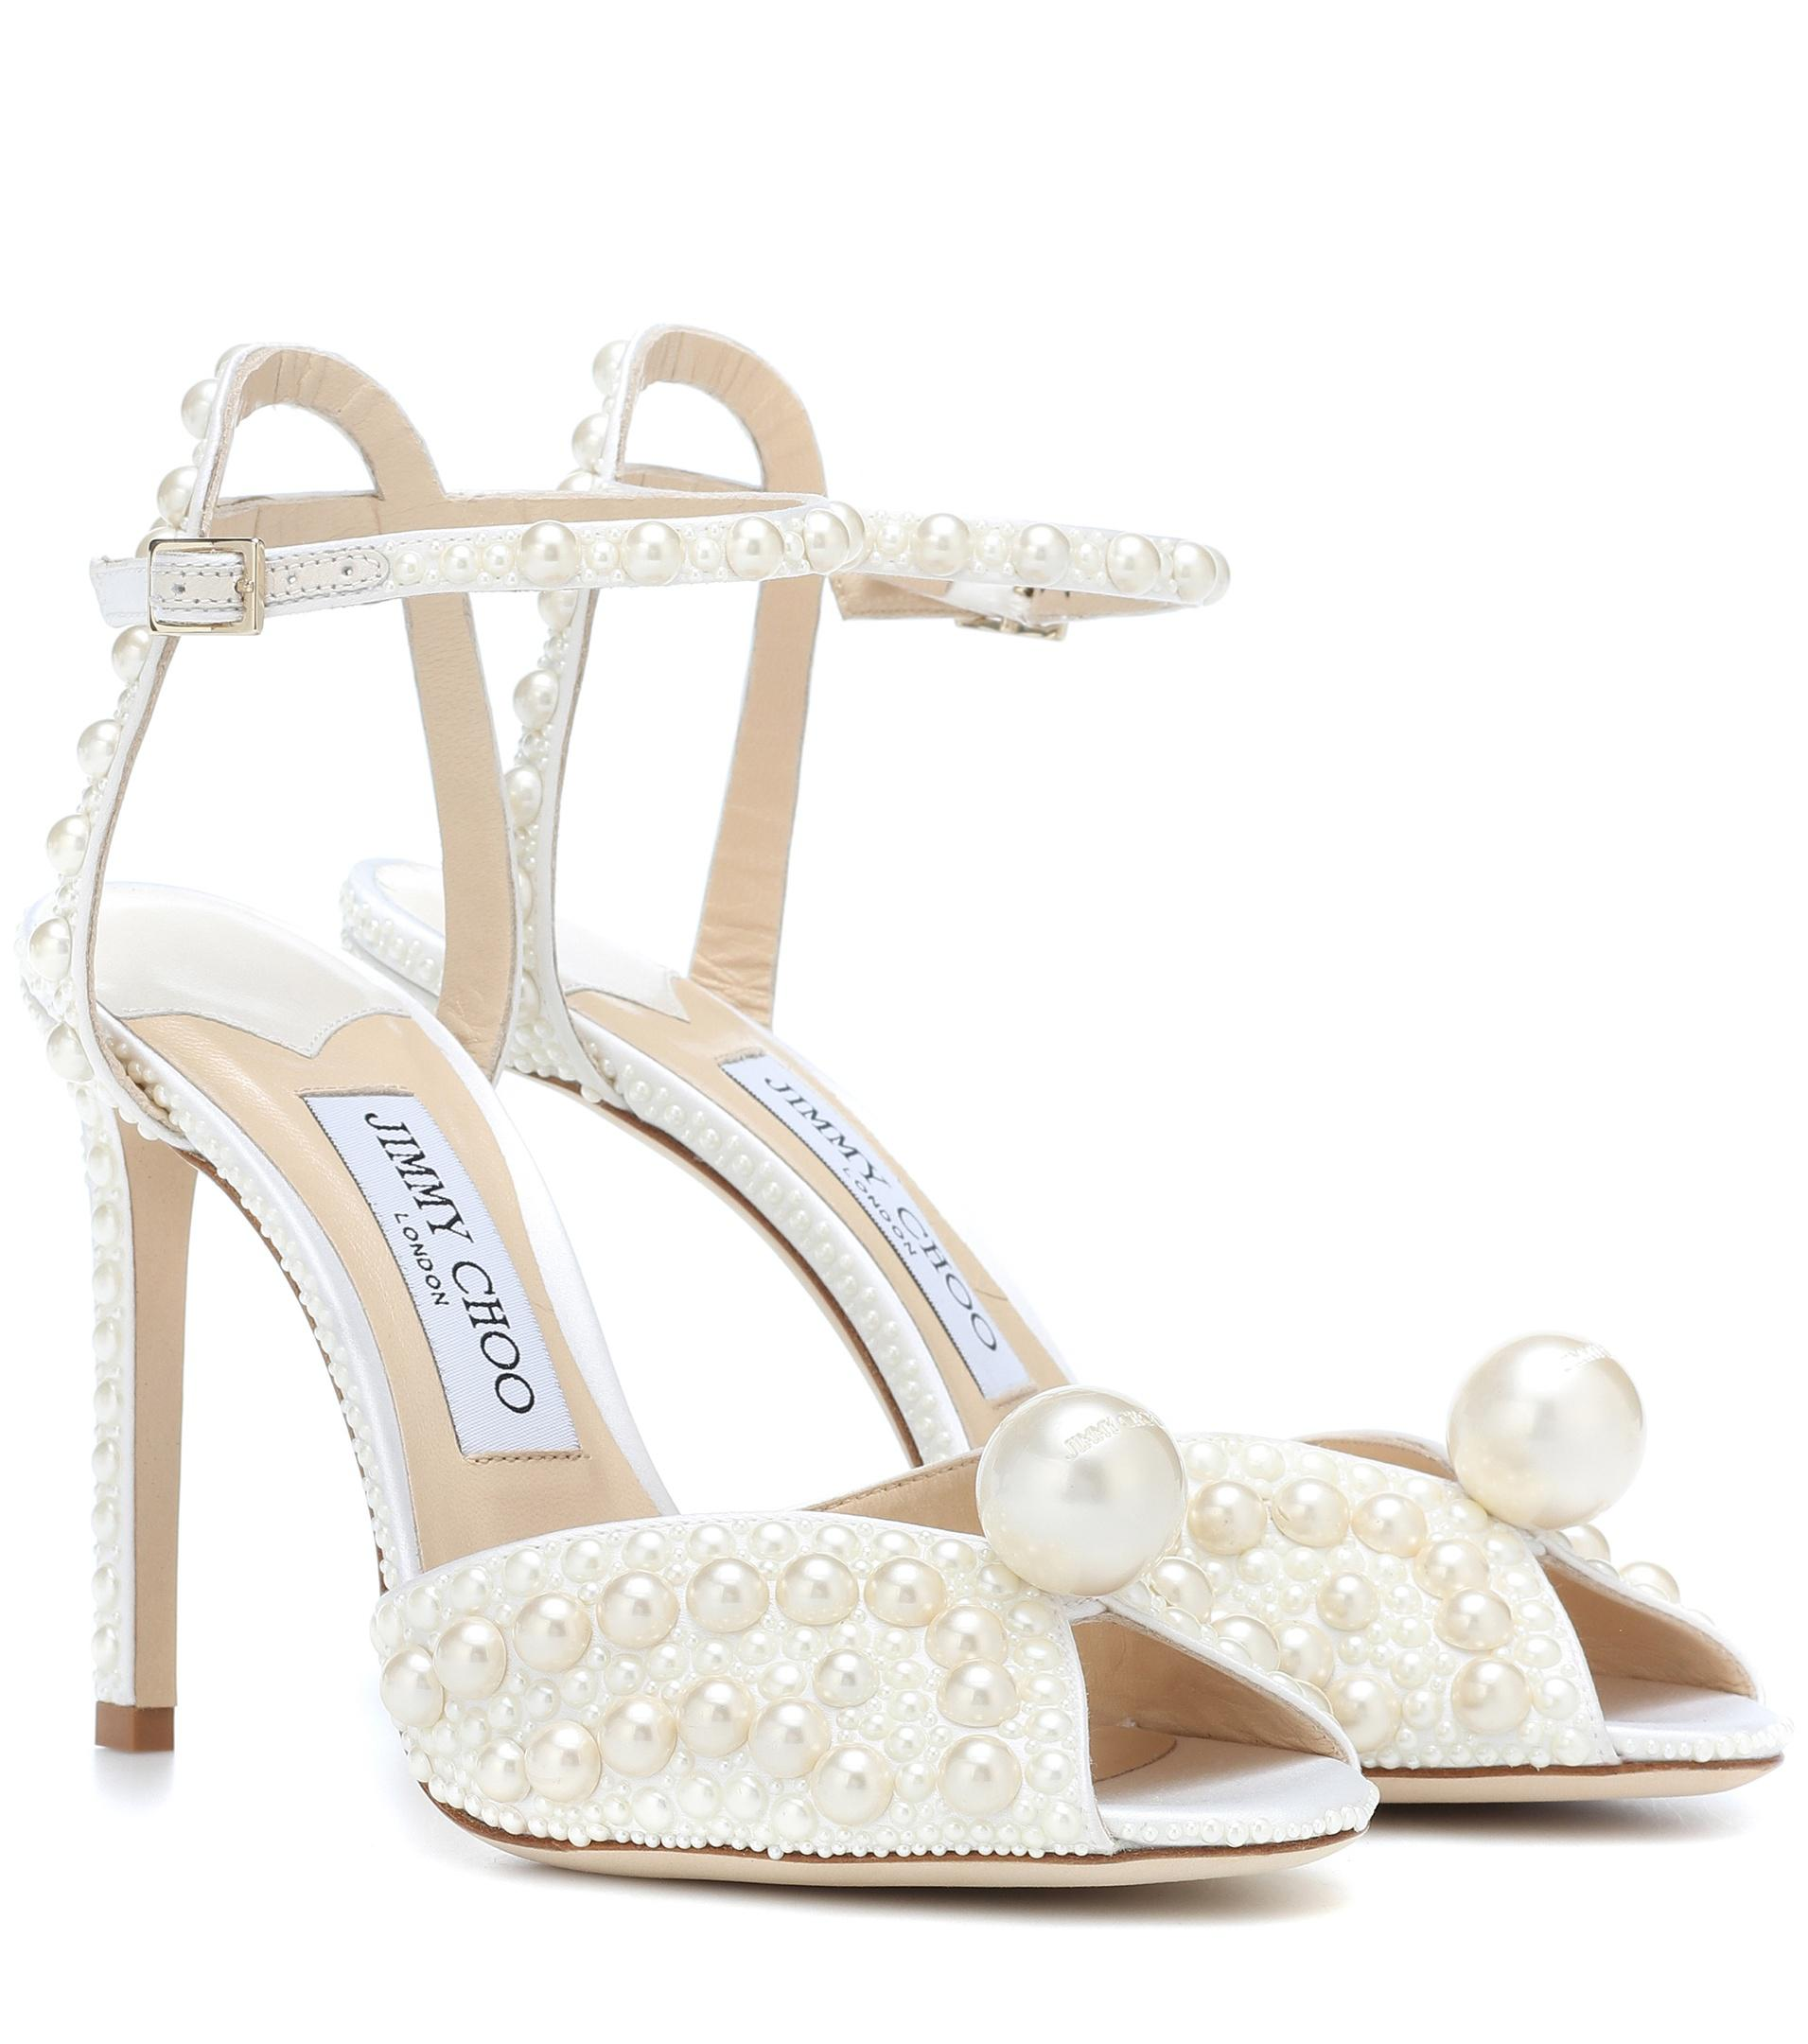 3b245f6fdcb Jimmy Choo Sacora 100 Embellished Sandals in White - Lyst